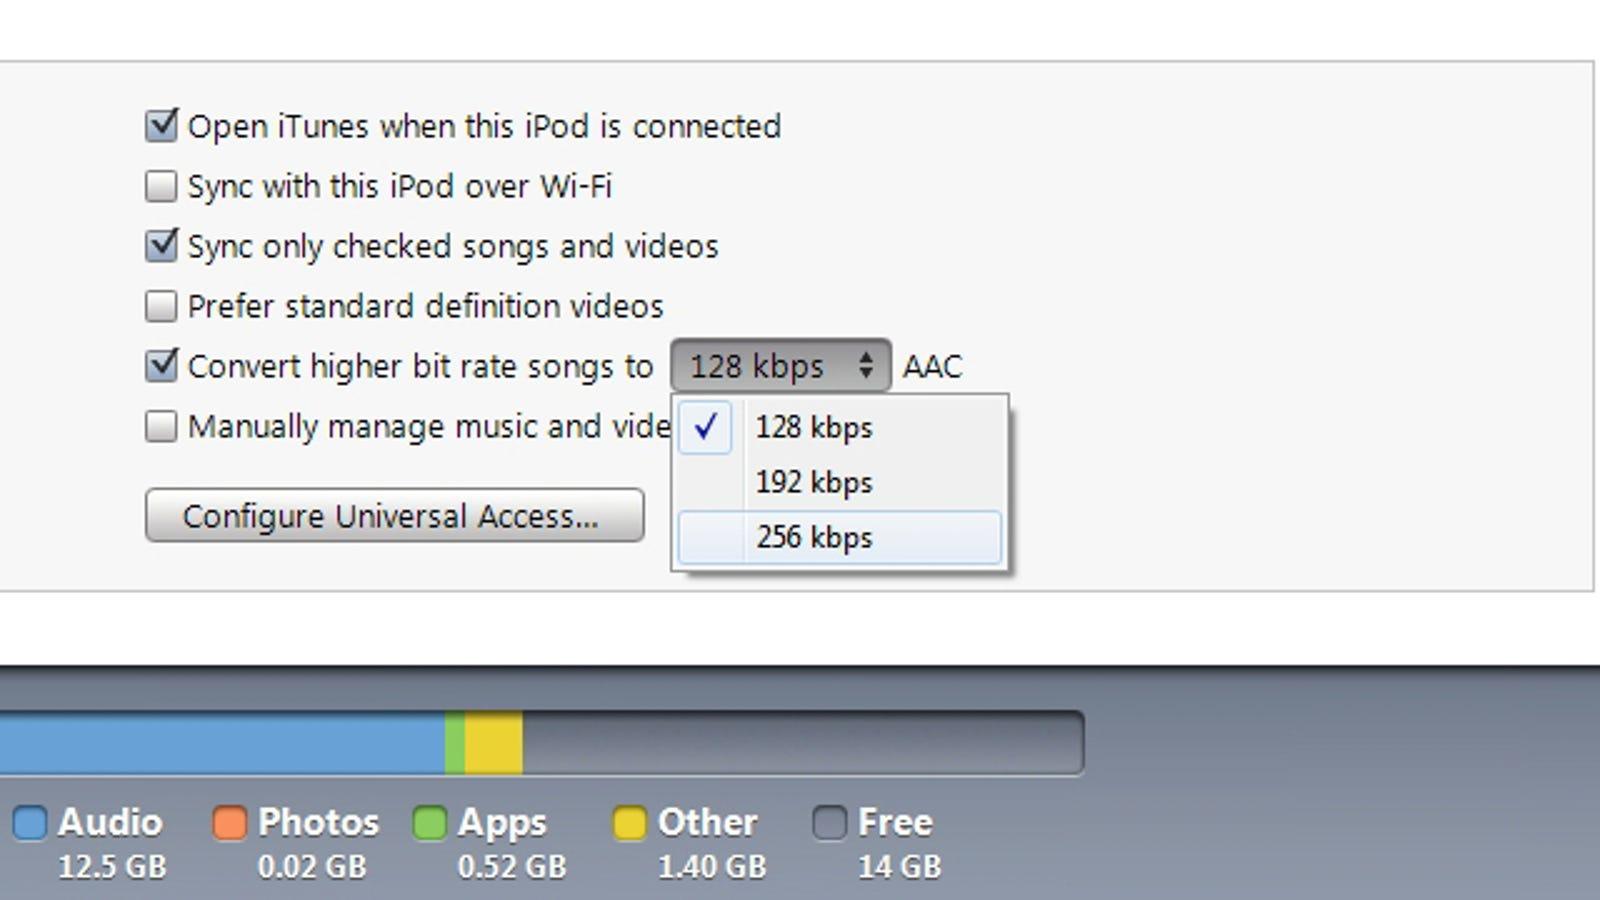 itunes 10.6 3 download windows